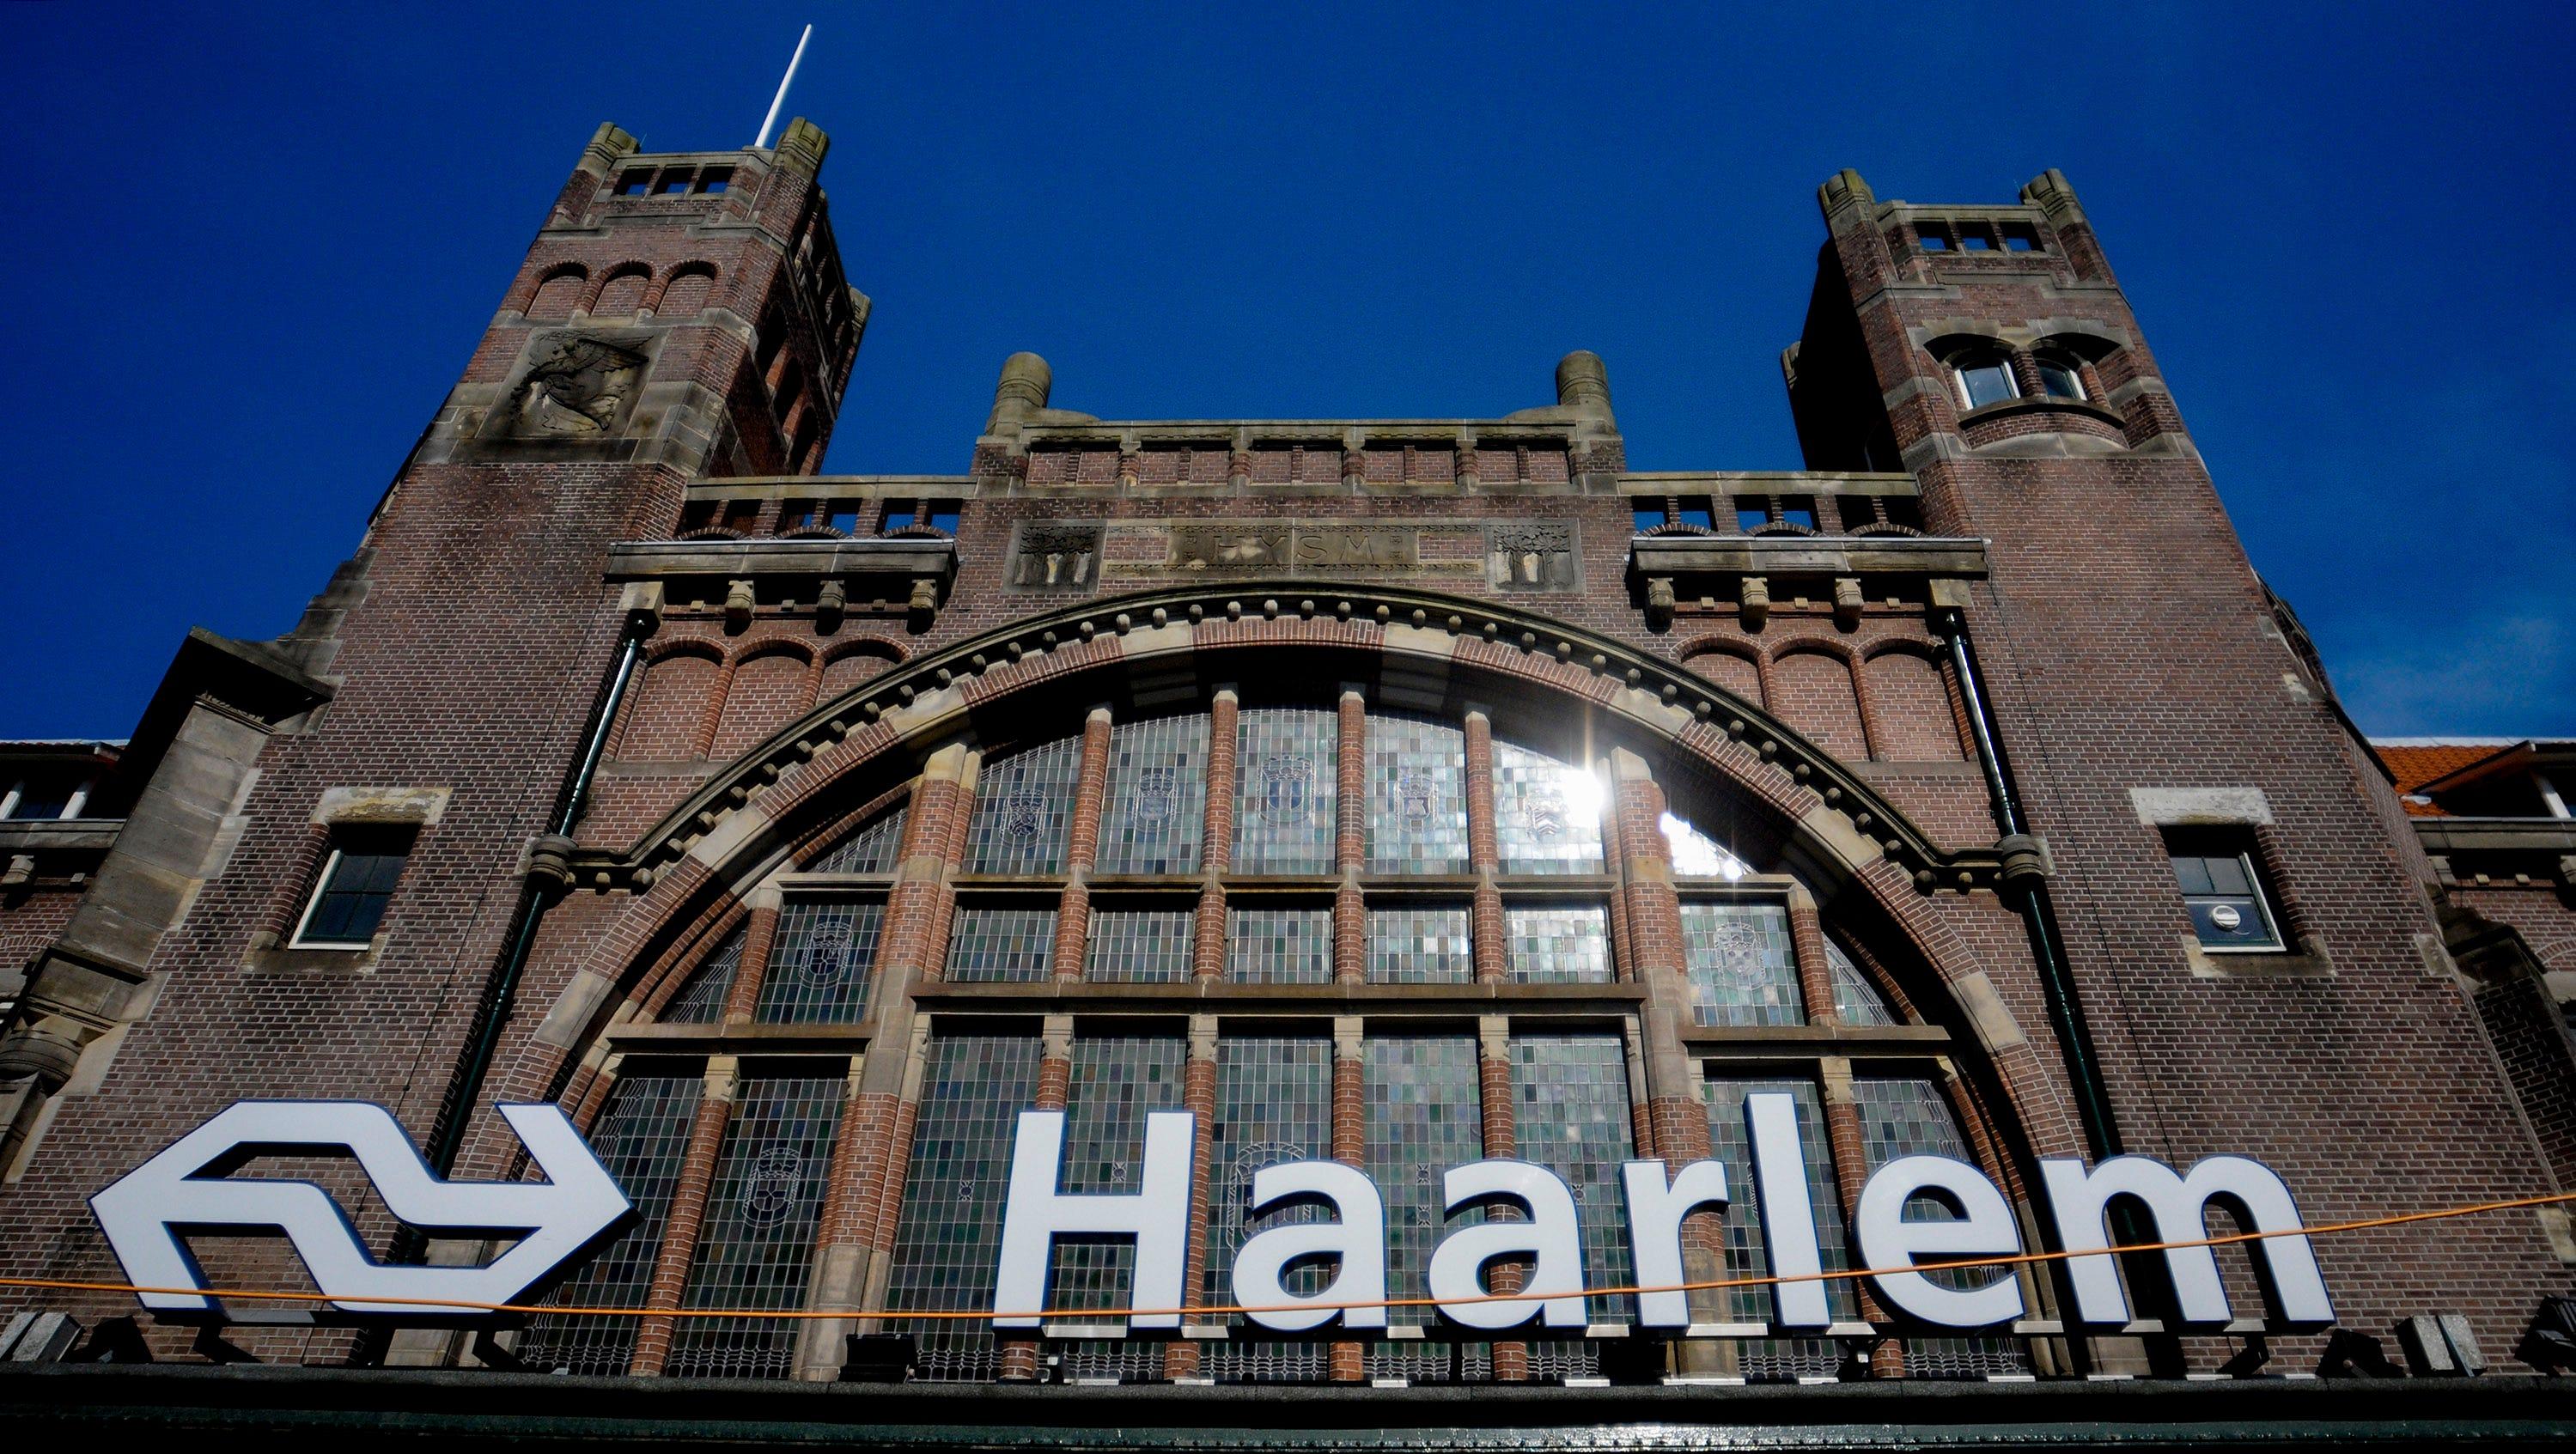 Haarlem train station.